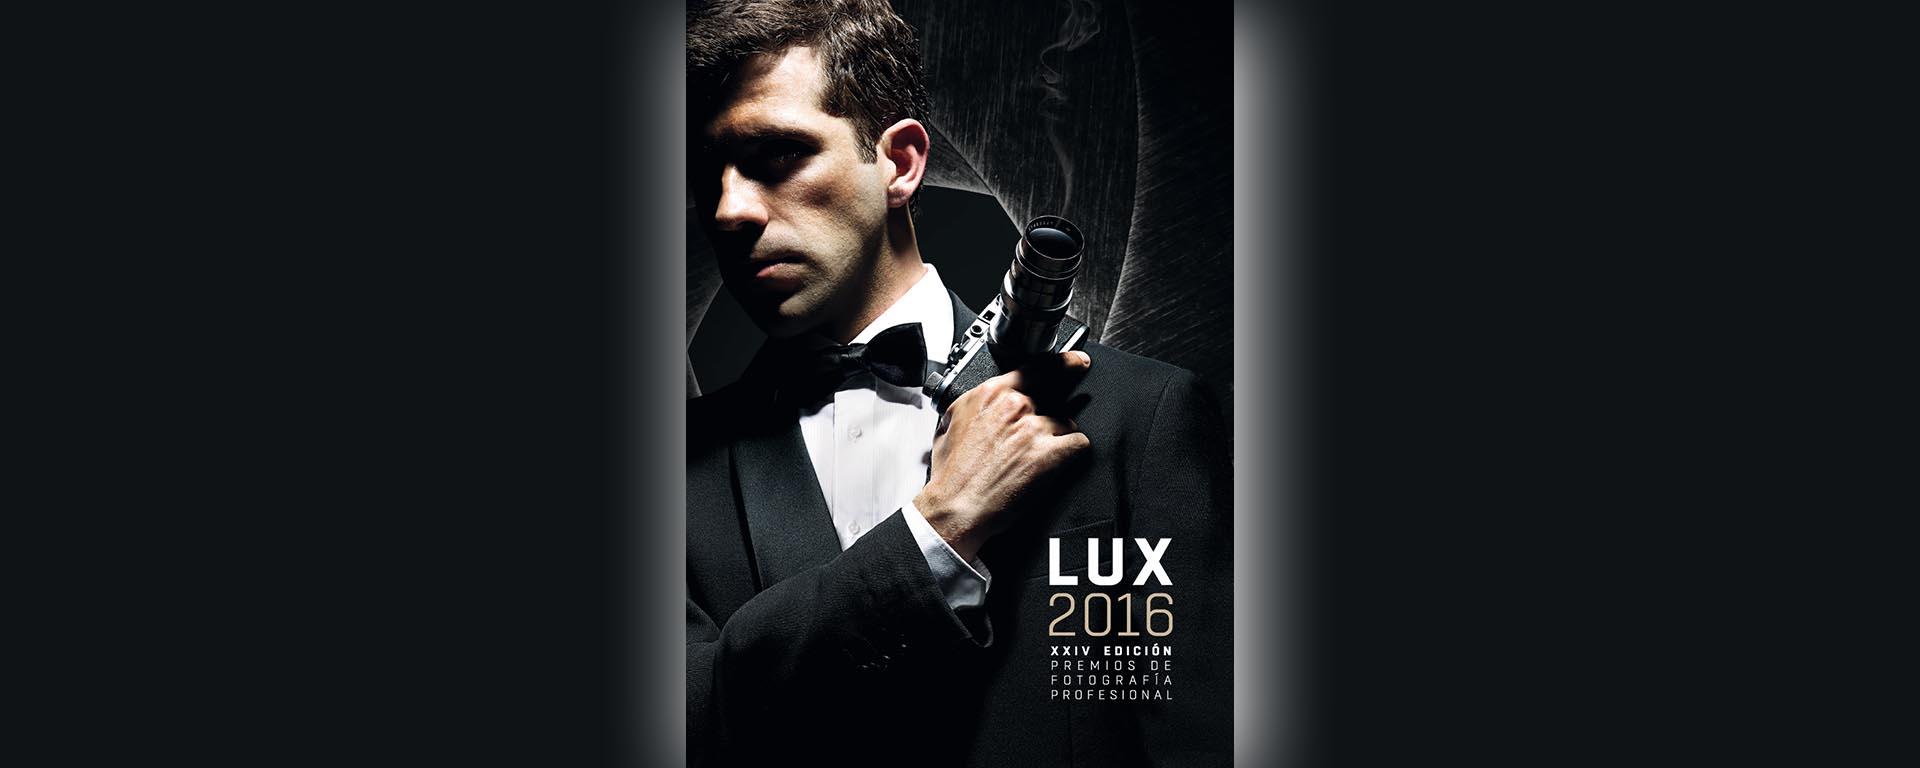 Premios Lux 2016